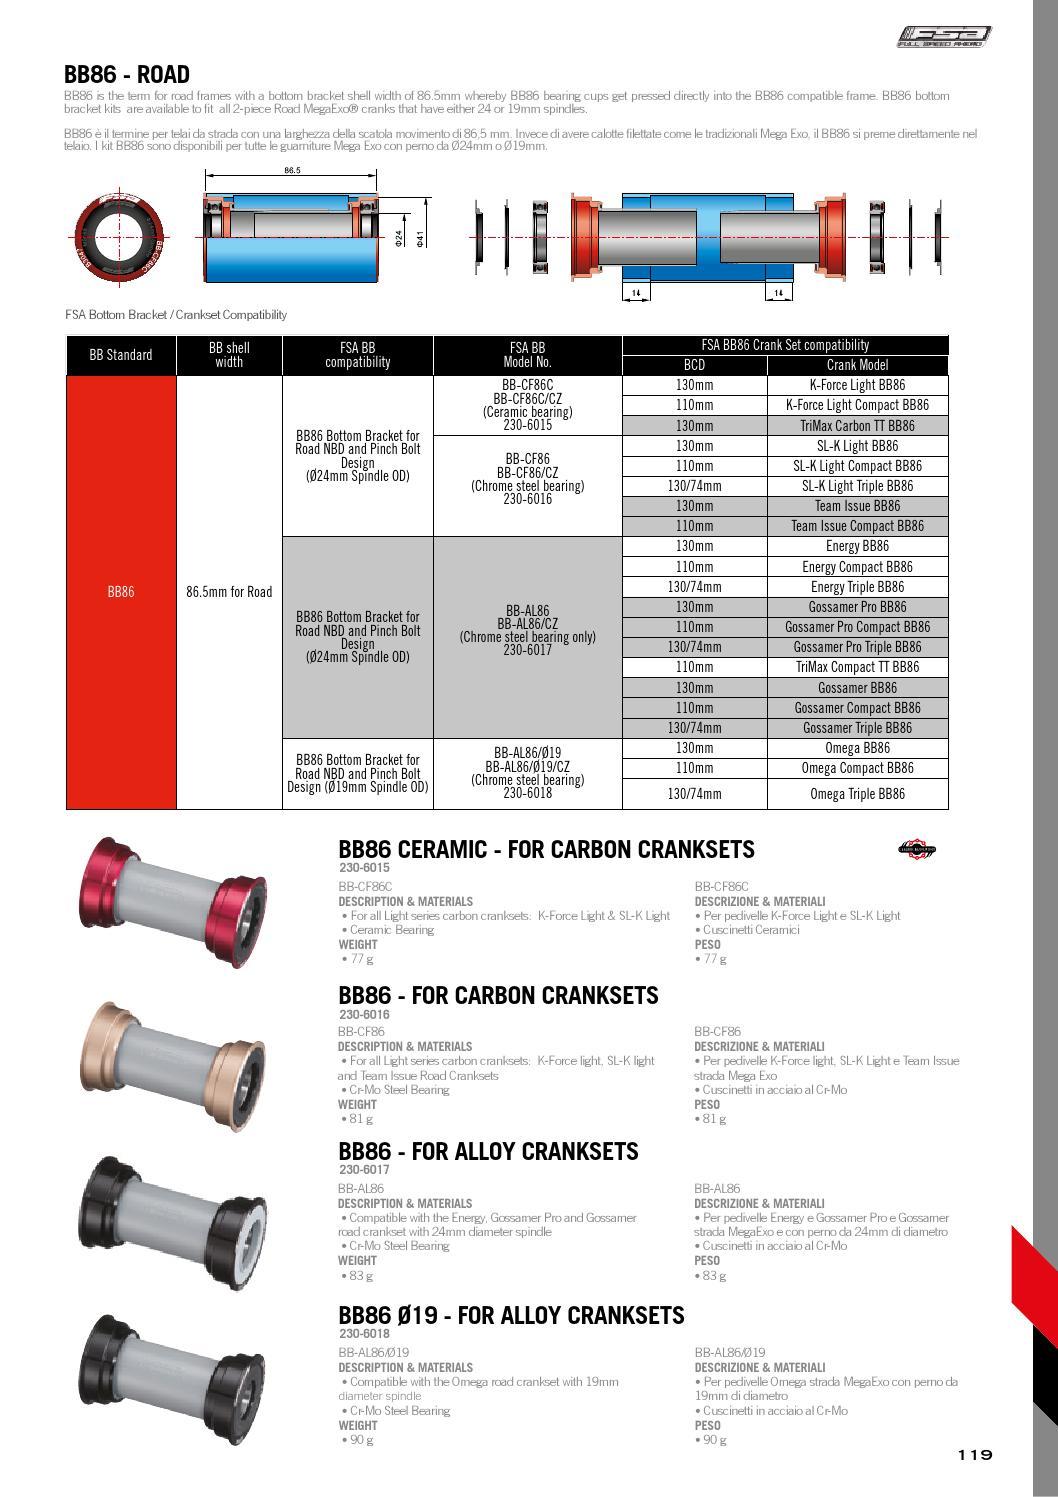 Fsa Bottom Bracket Chainrings & BMX Sprockets BB-AL86 24 Megaexo 230-6017 Cycling